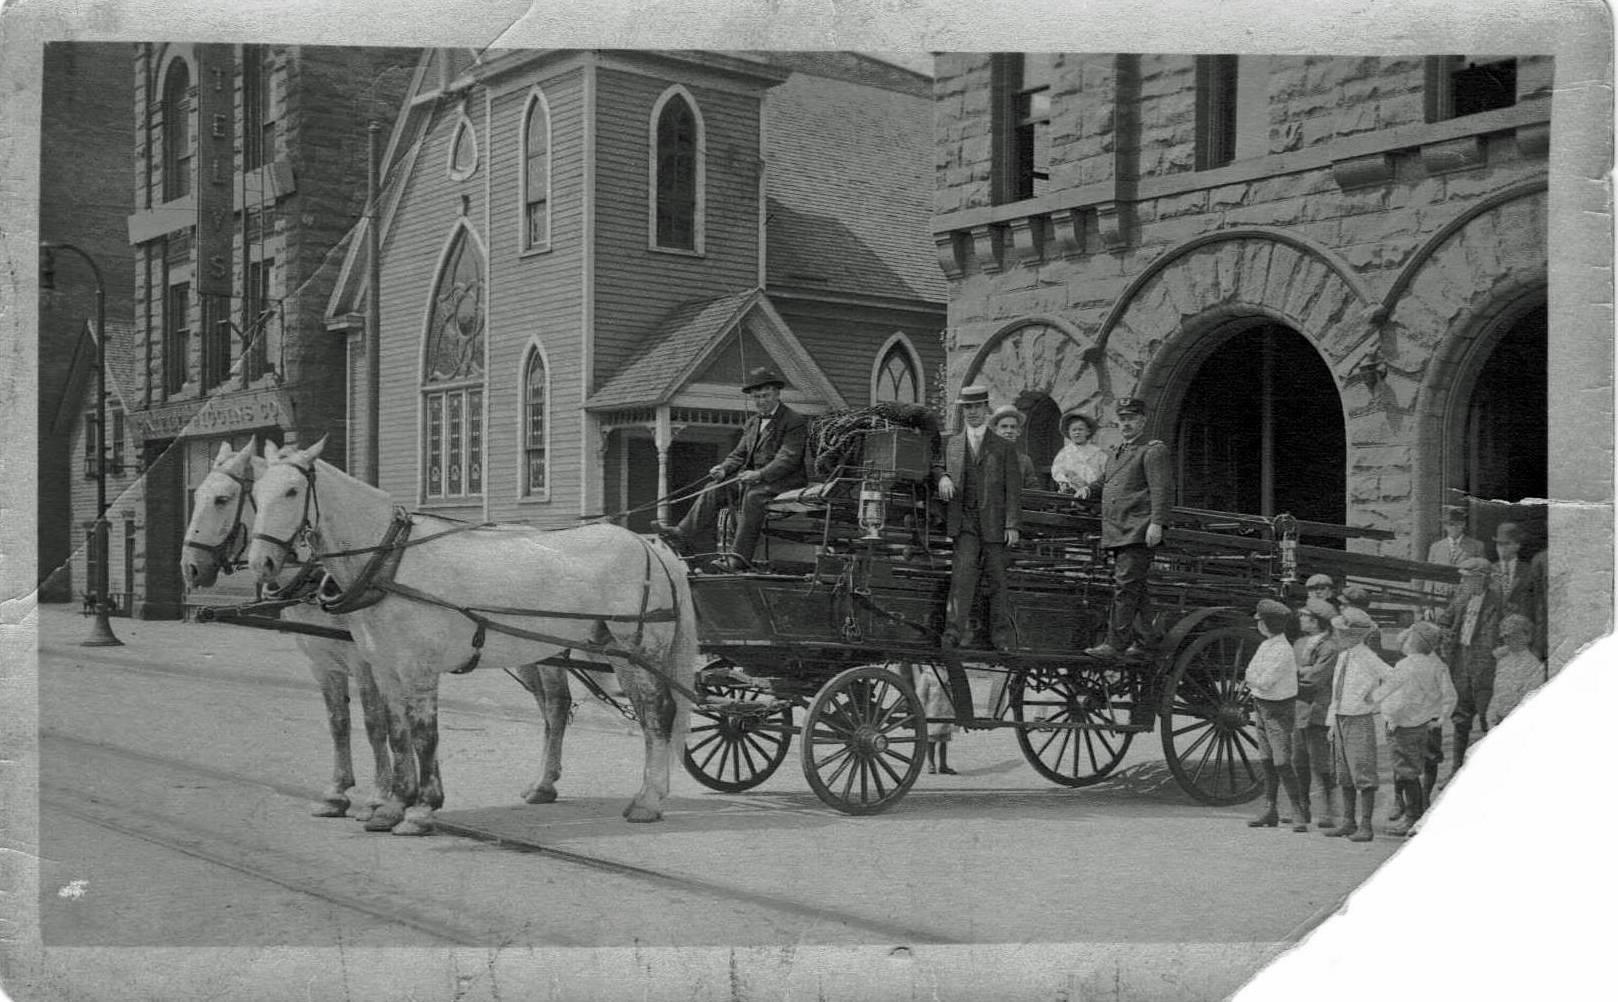 1900 Hose wagon photo (post card).